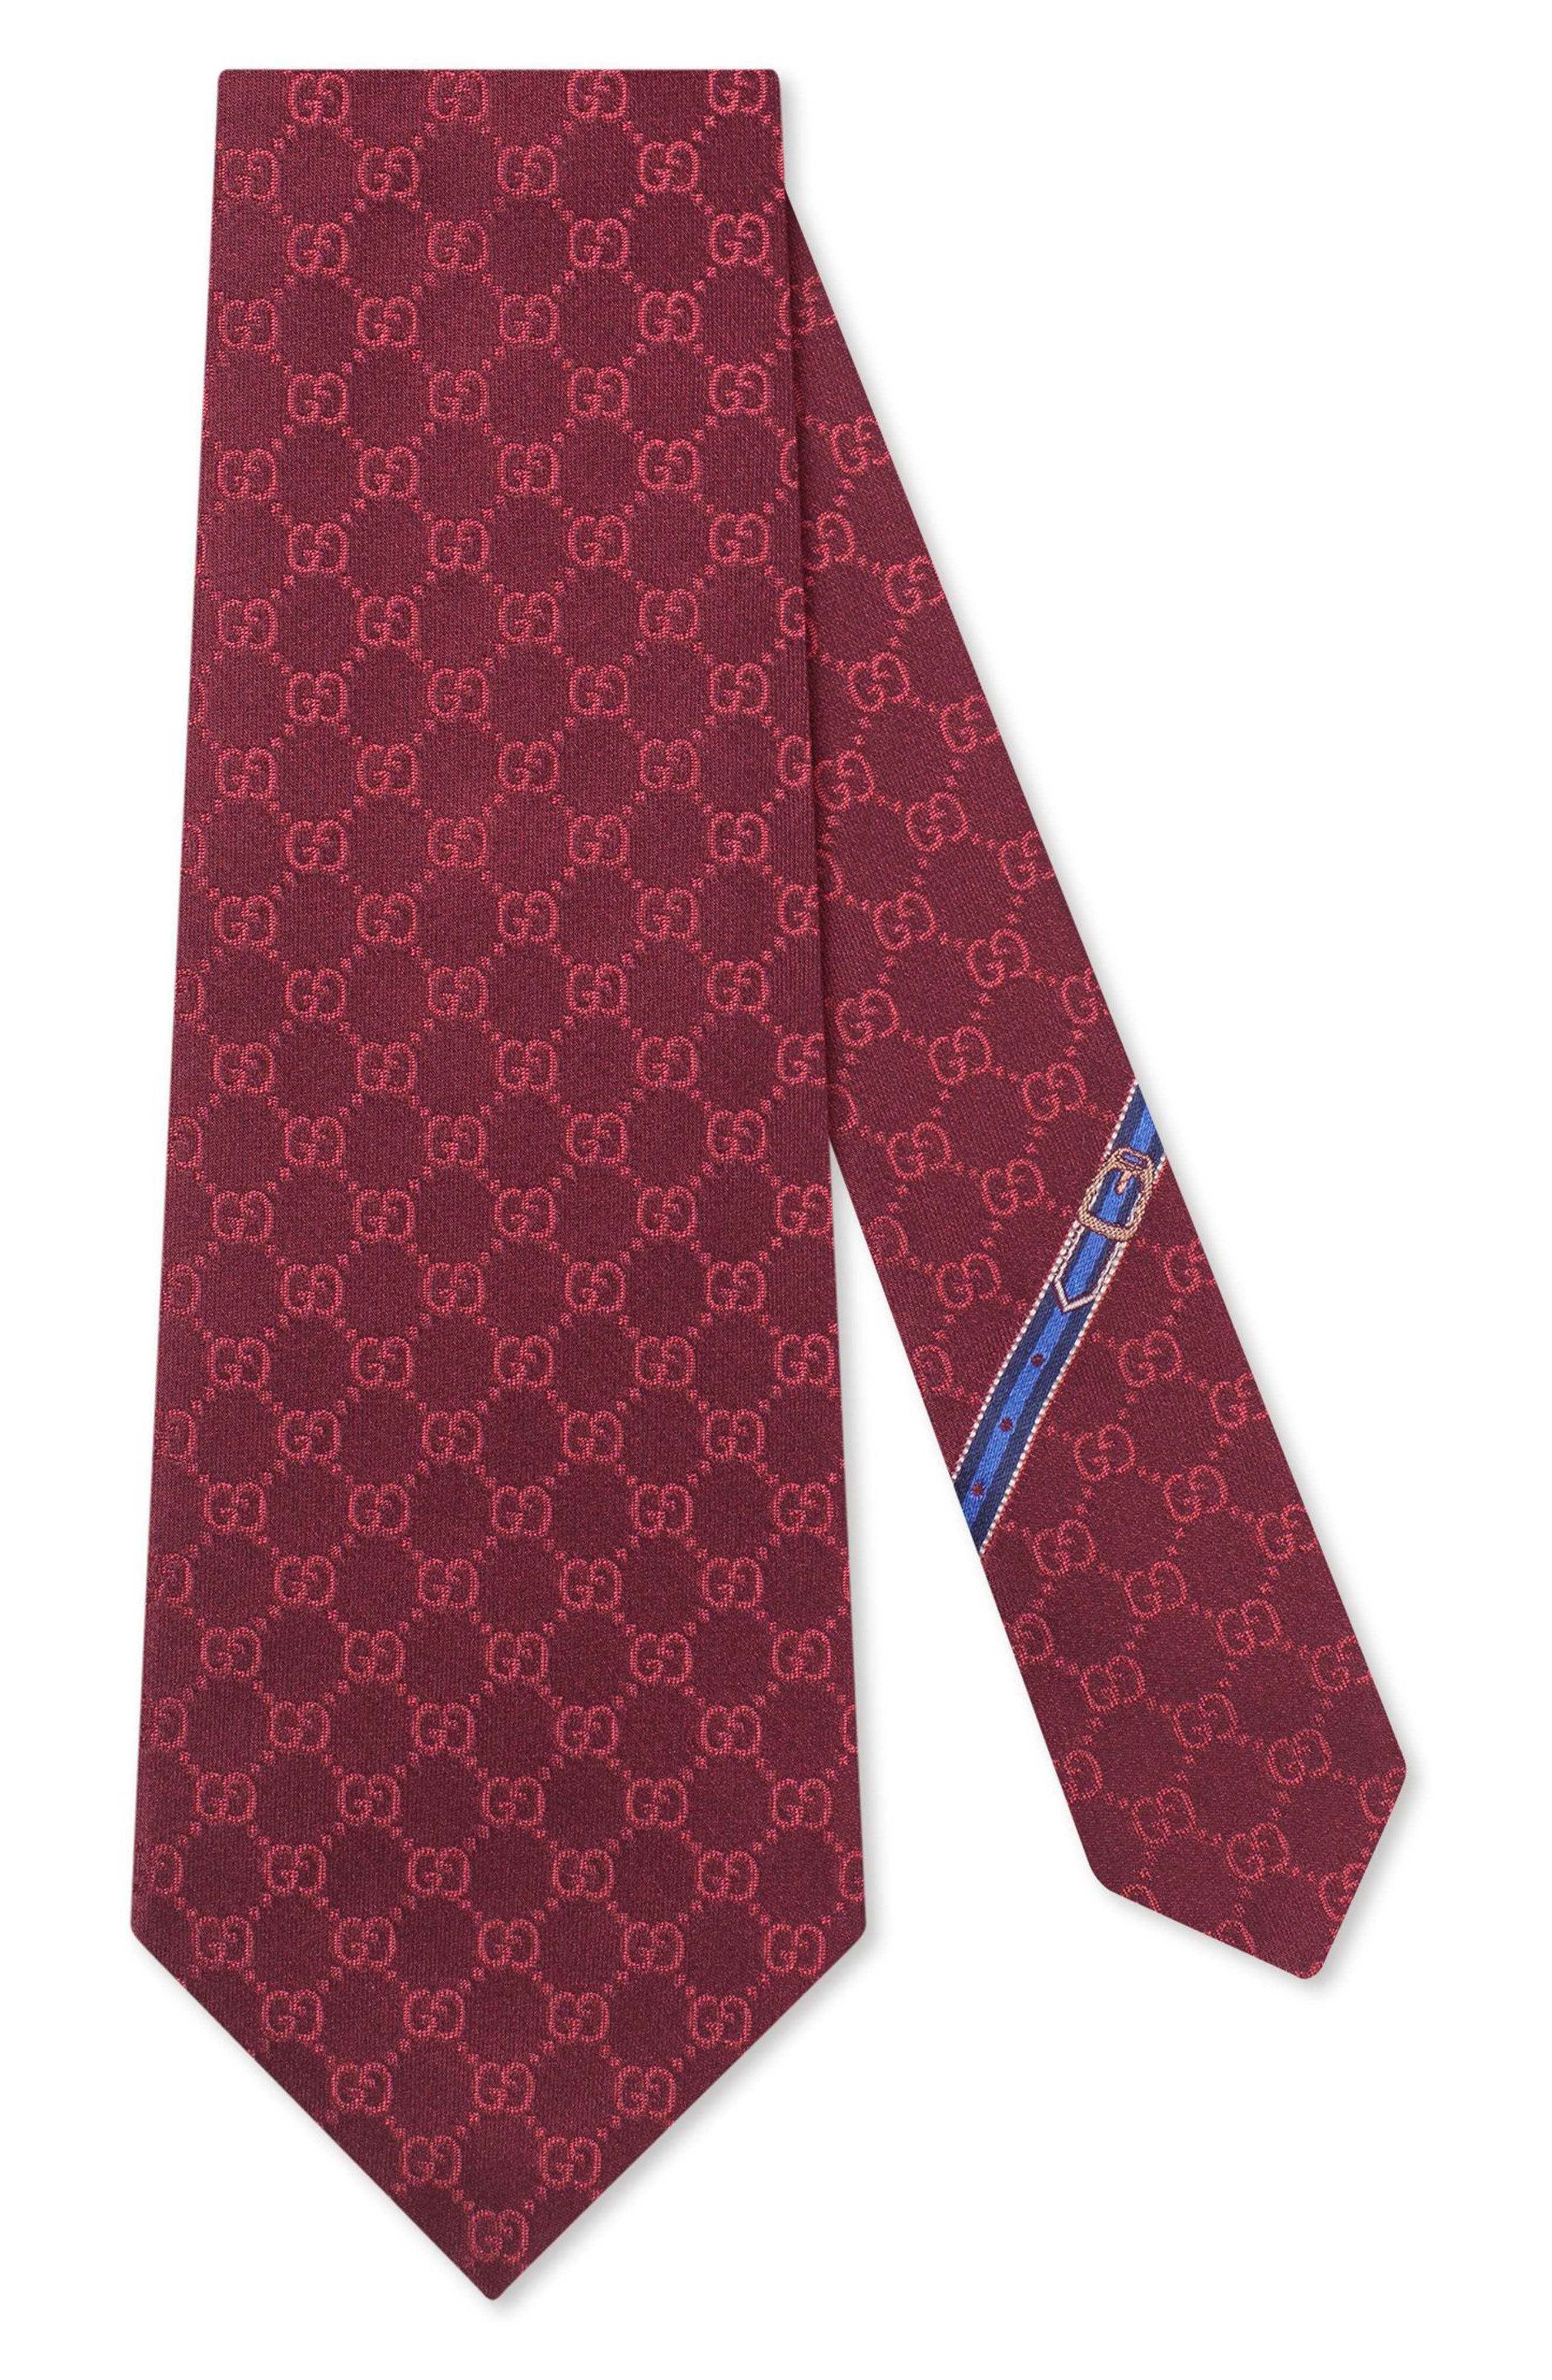 Alternate Image 1 Selected - Gucci Fedra Silk Jacquard Tie